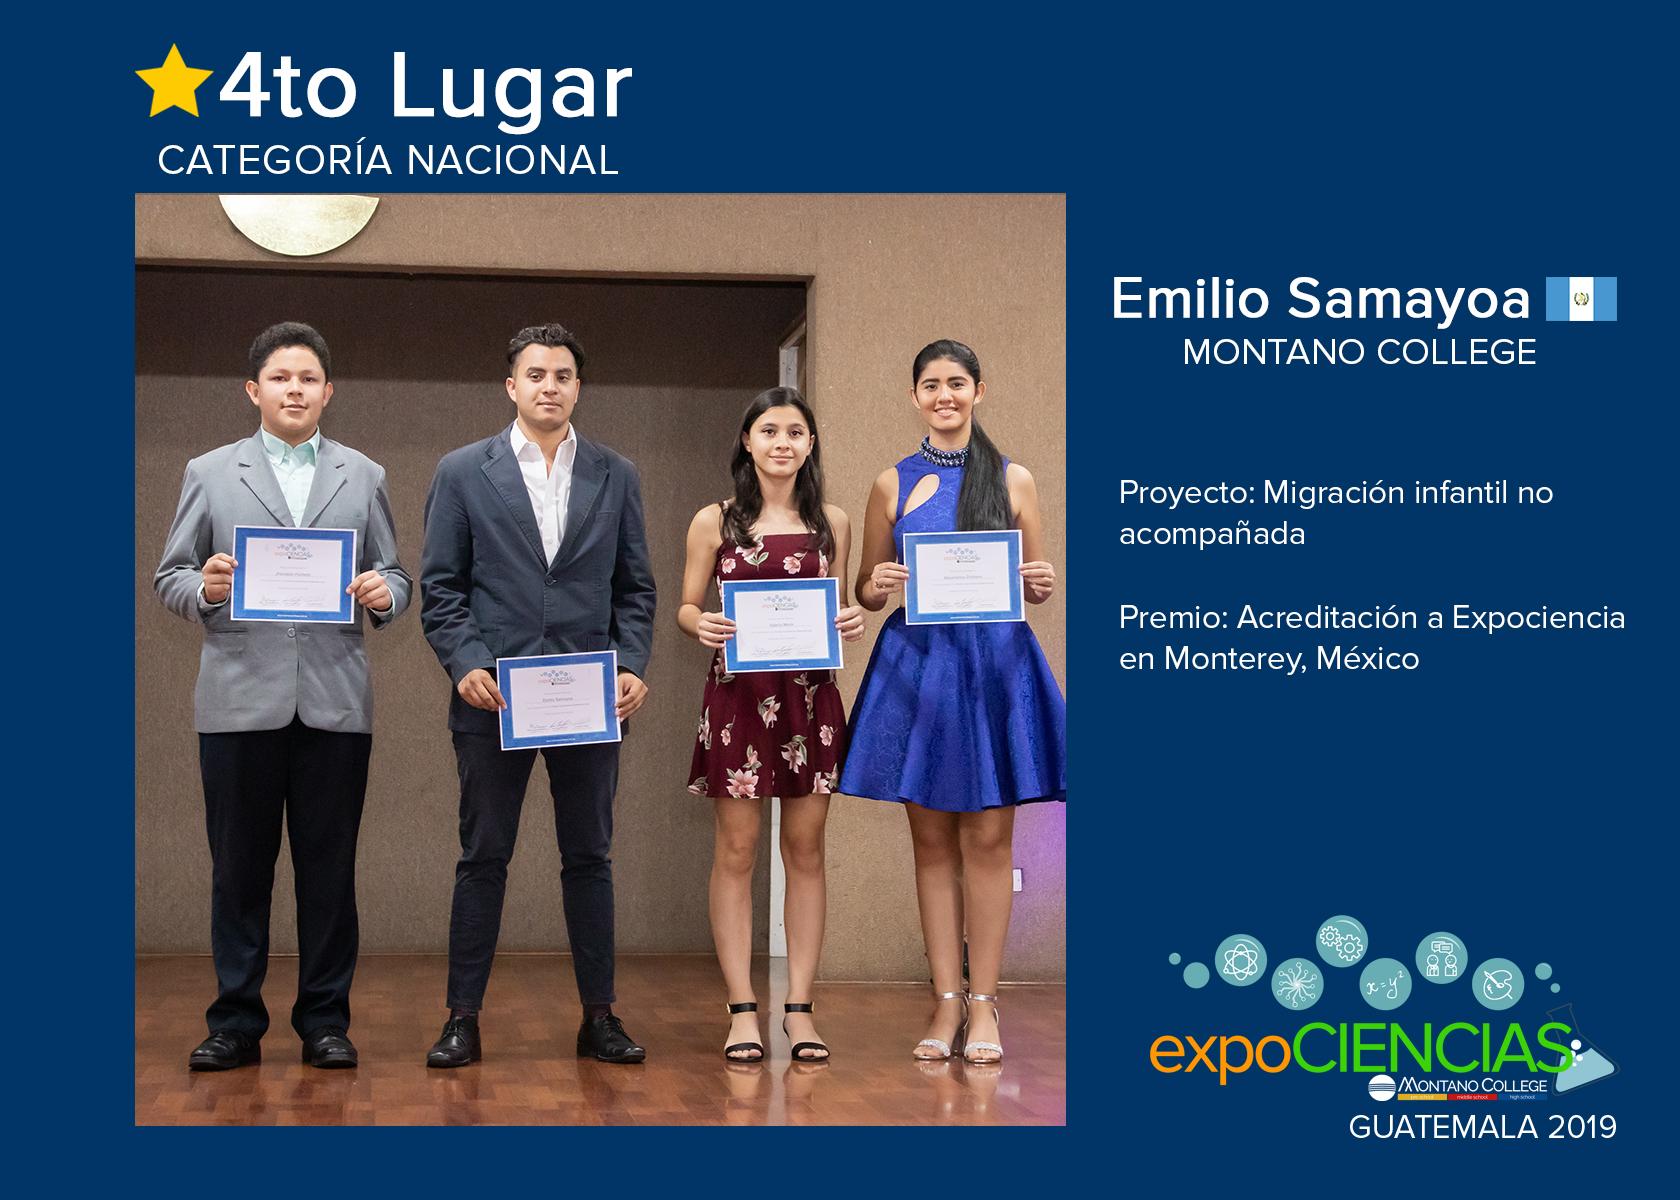 CUARTO LUGAR:  EMILIO SAMAYOA